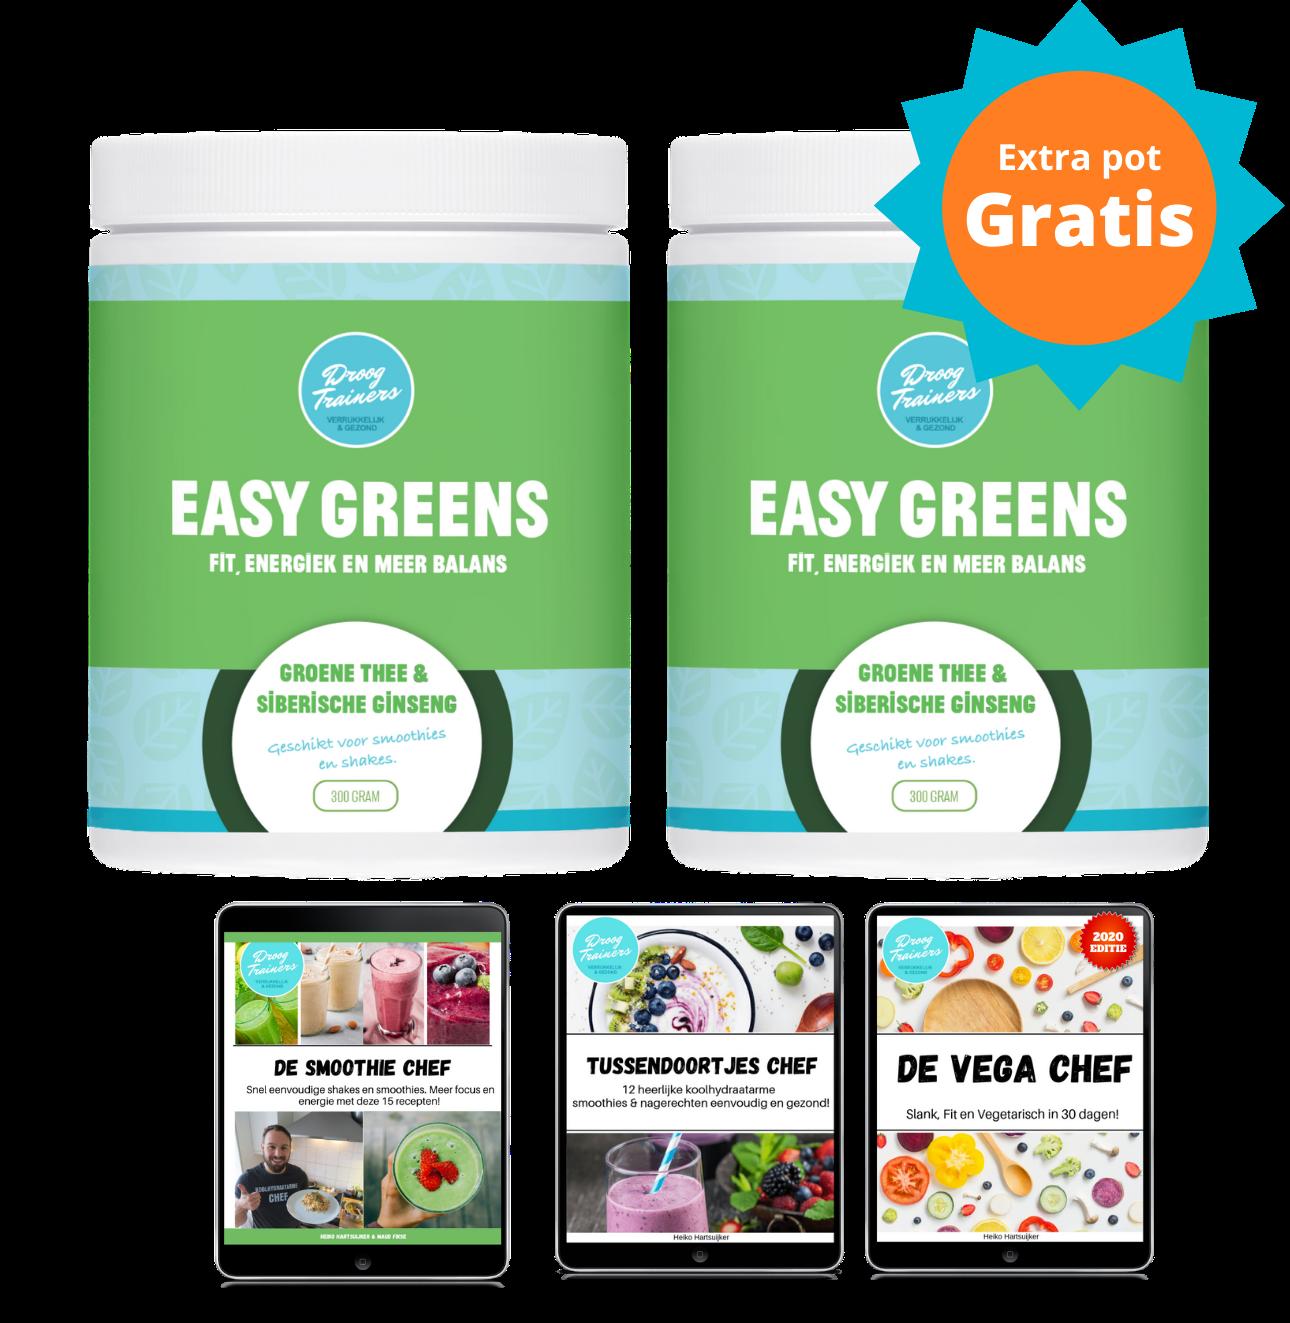 bundel greens 1290x1323px-2greens